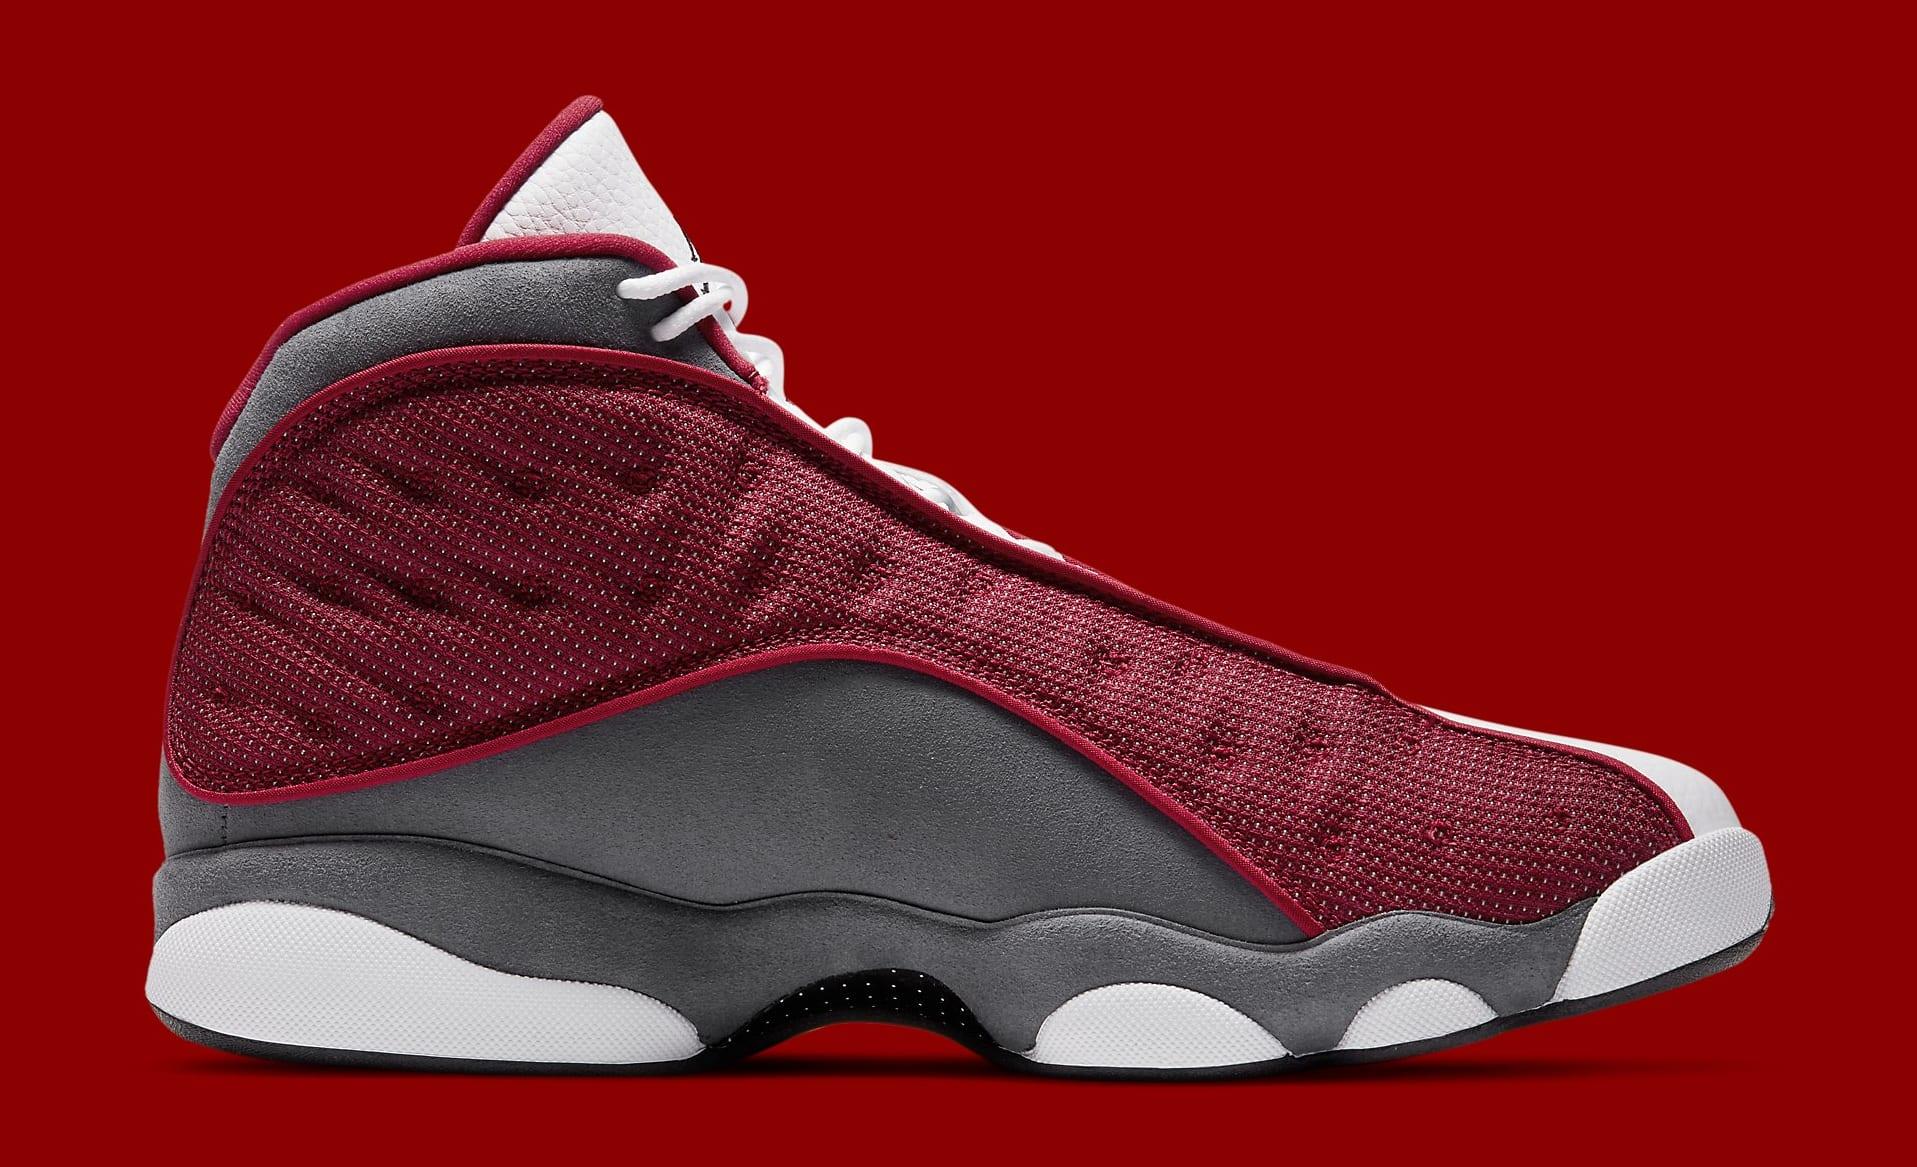 Air Jordan 13 Retro 'Gym Red' DJ5982-600 Medial